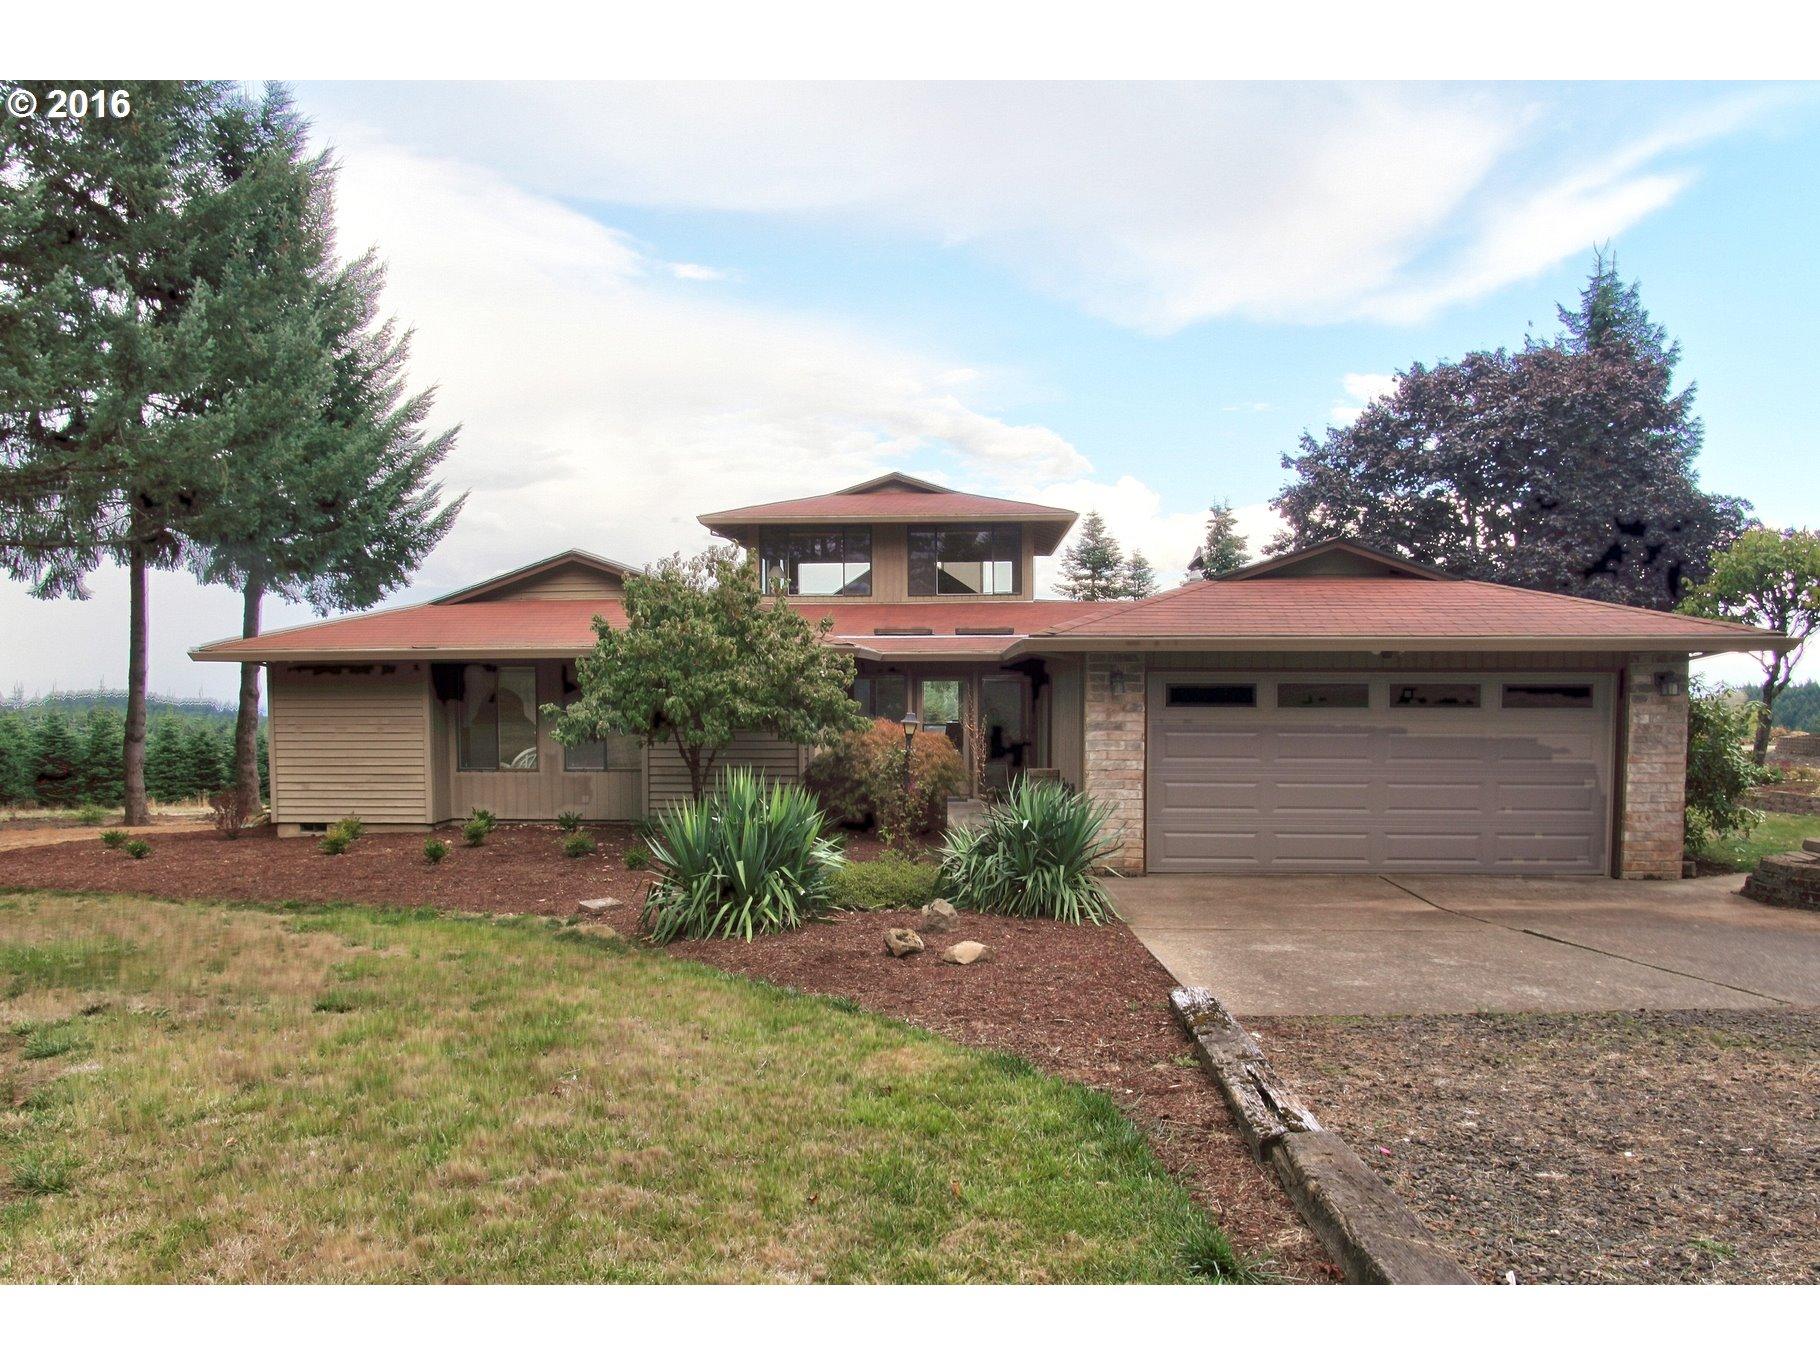 $725,000 - 3Br/2Ba -  for Sale in Bald Peak, Hillsboro